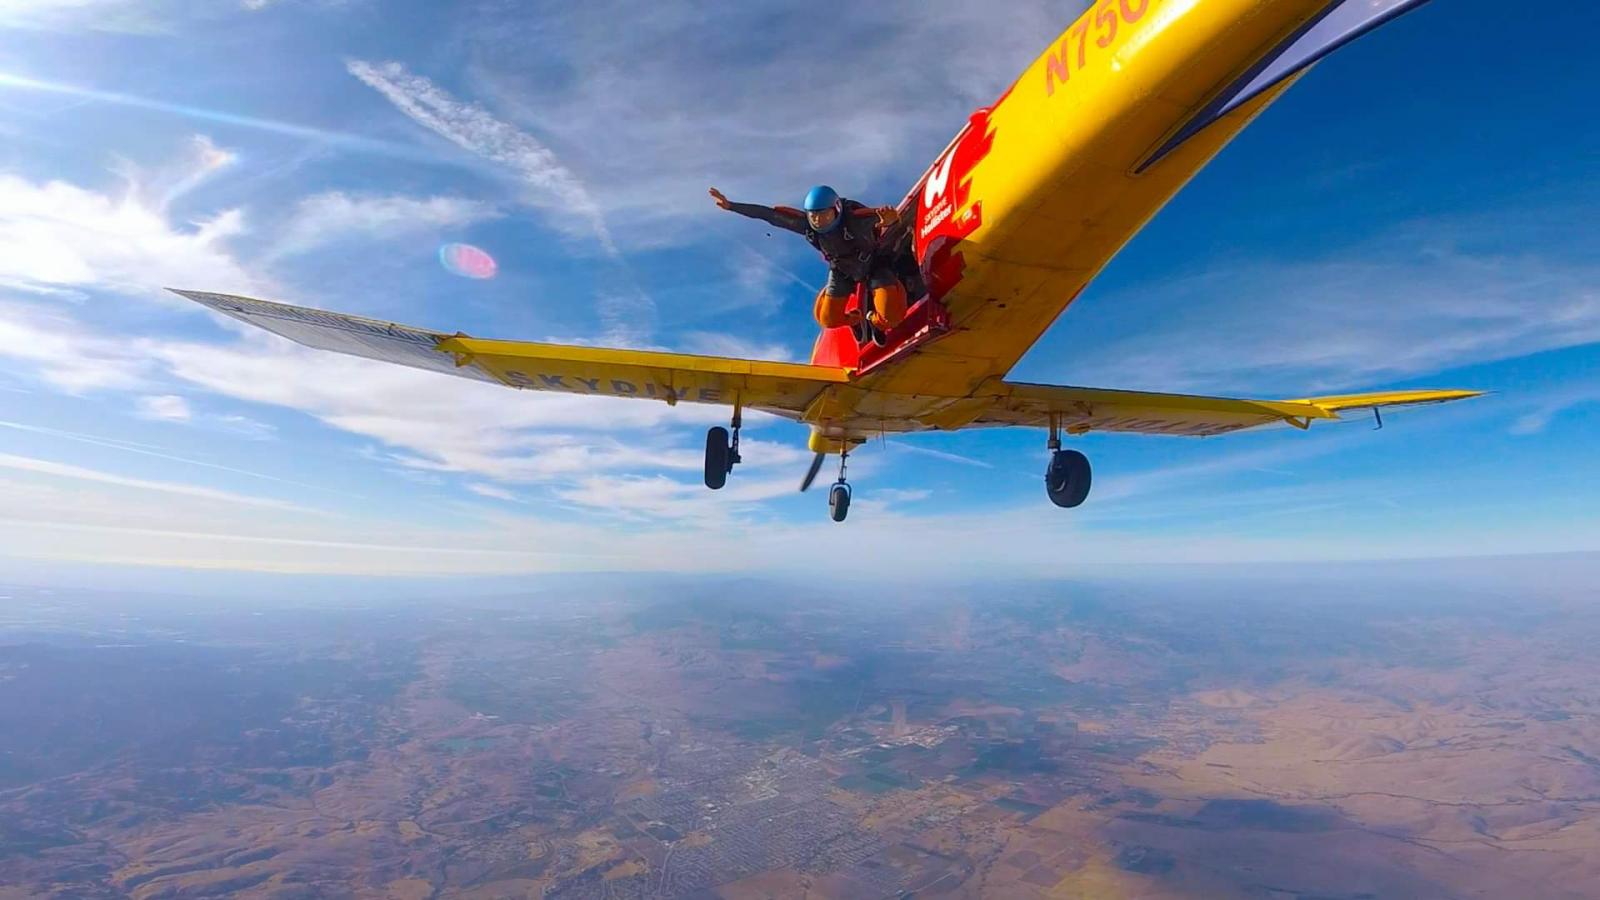 Esteve exits the PAC 750Xl at Skydive Hollister